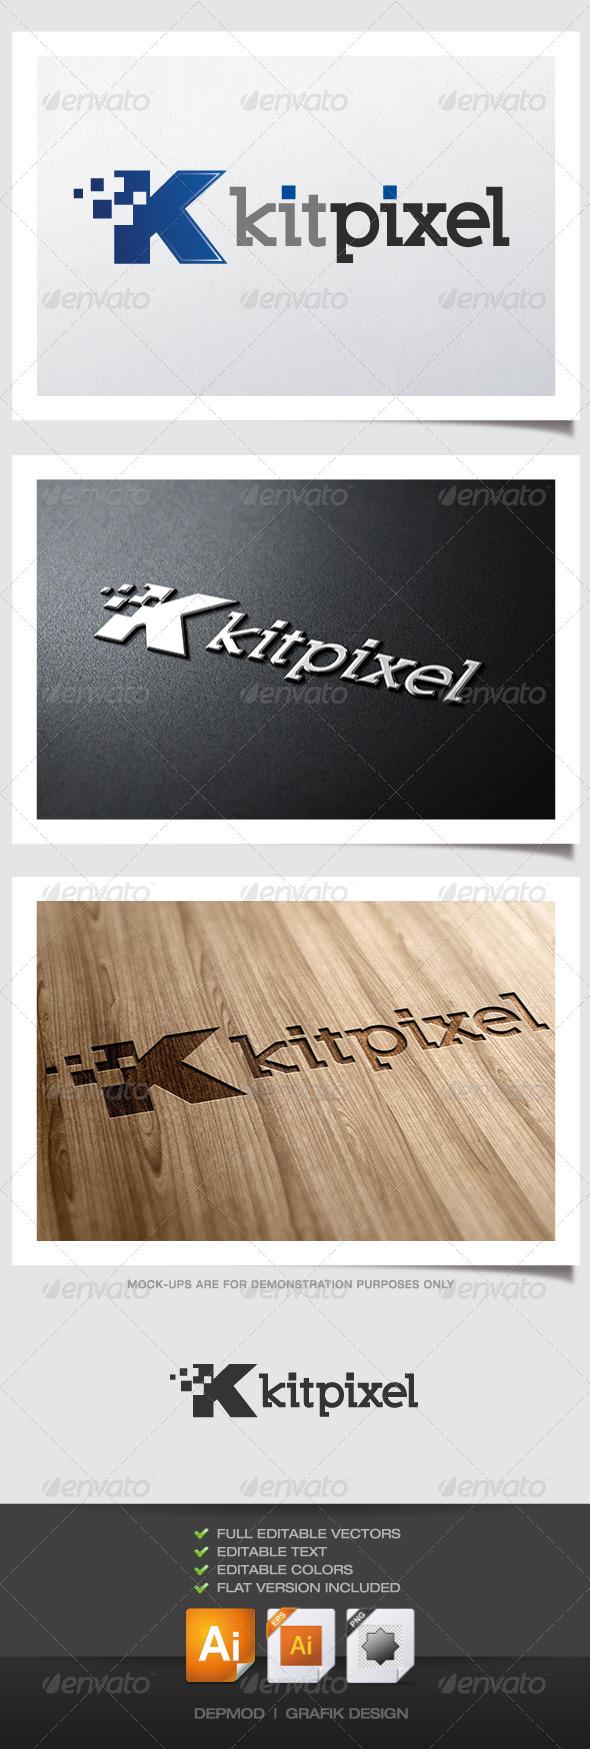 GraphicRiver Kit Pixel Logo 4346698